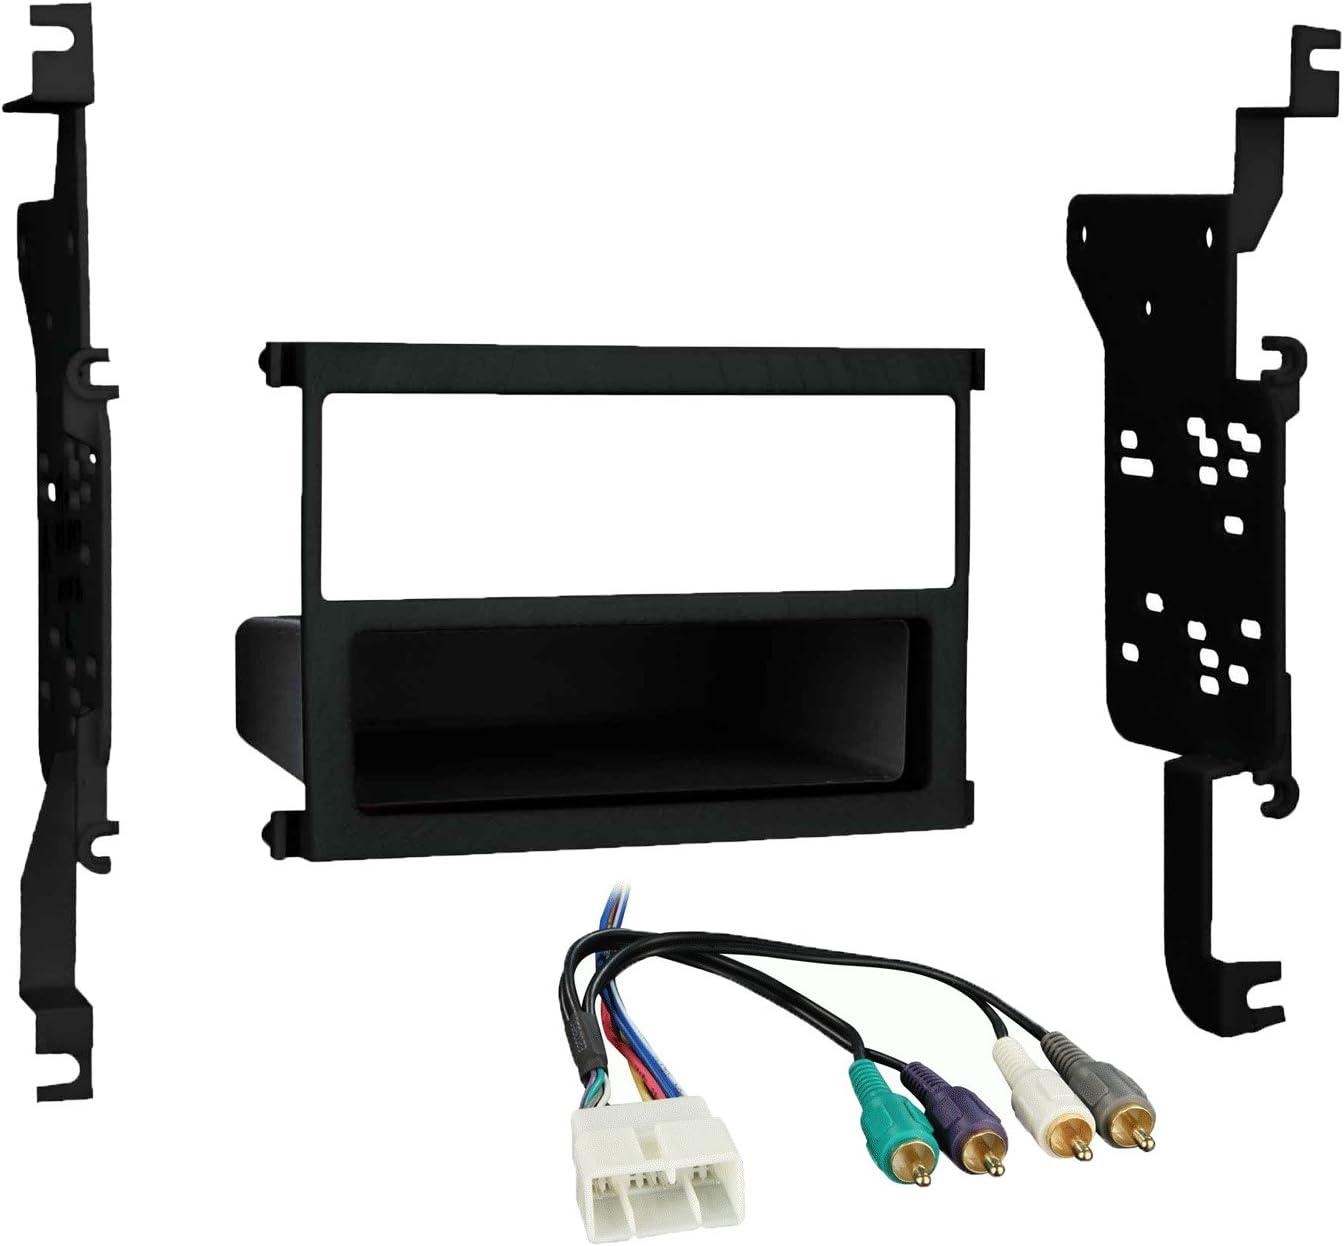 Amazon.com: Metra 99-8157B Dash Kit + Amp Integration Harness for 92-00  Lexus SC300/SC400: Car ElectronicsAmazon.com